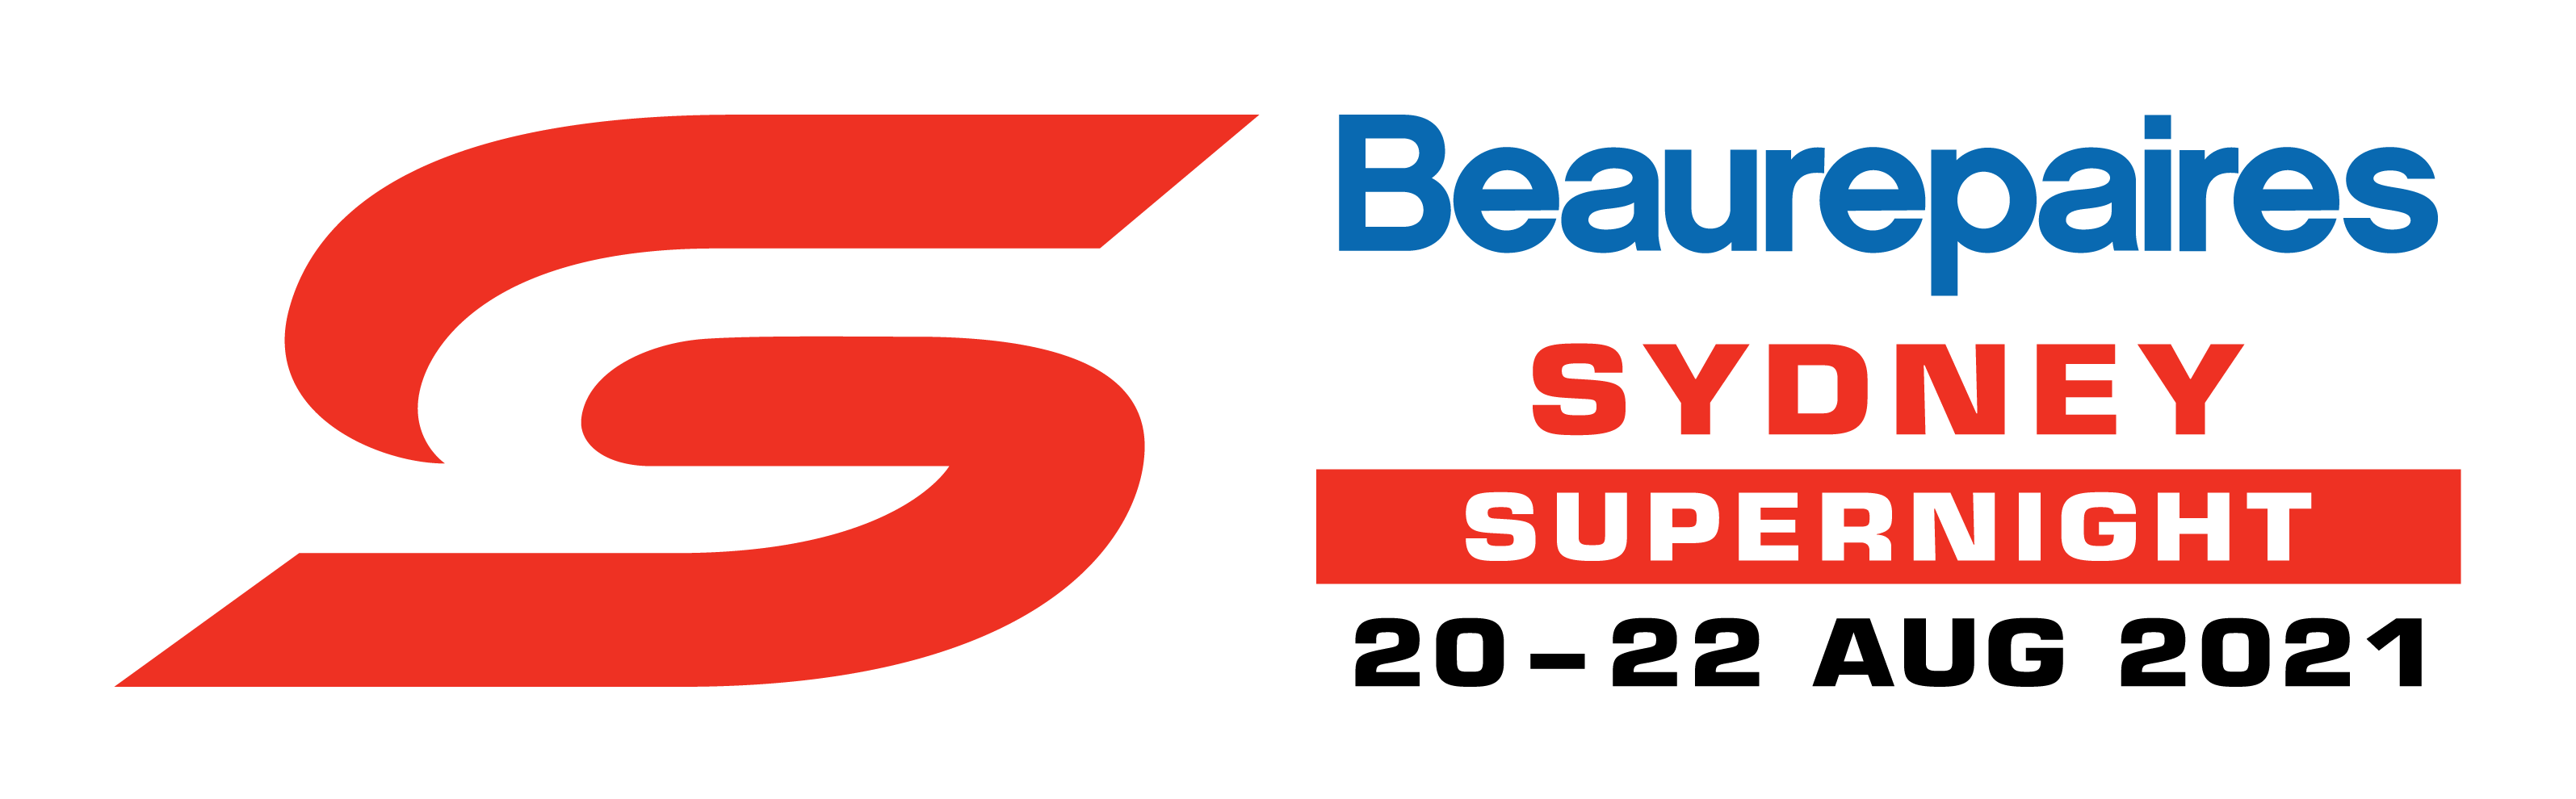 V8 Supercars - Beaurepaires Sydney SuperNight logo